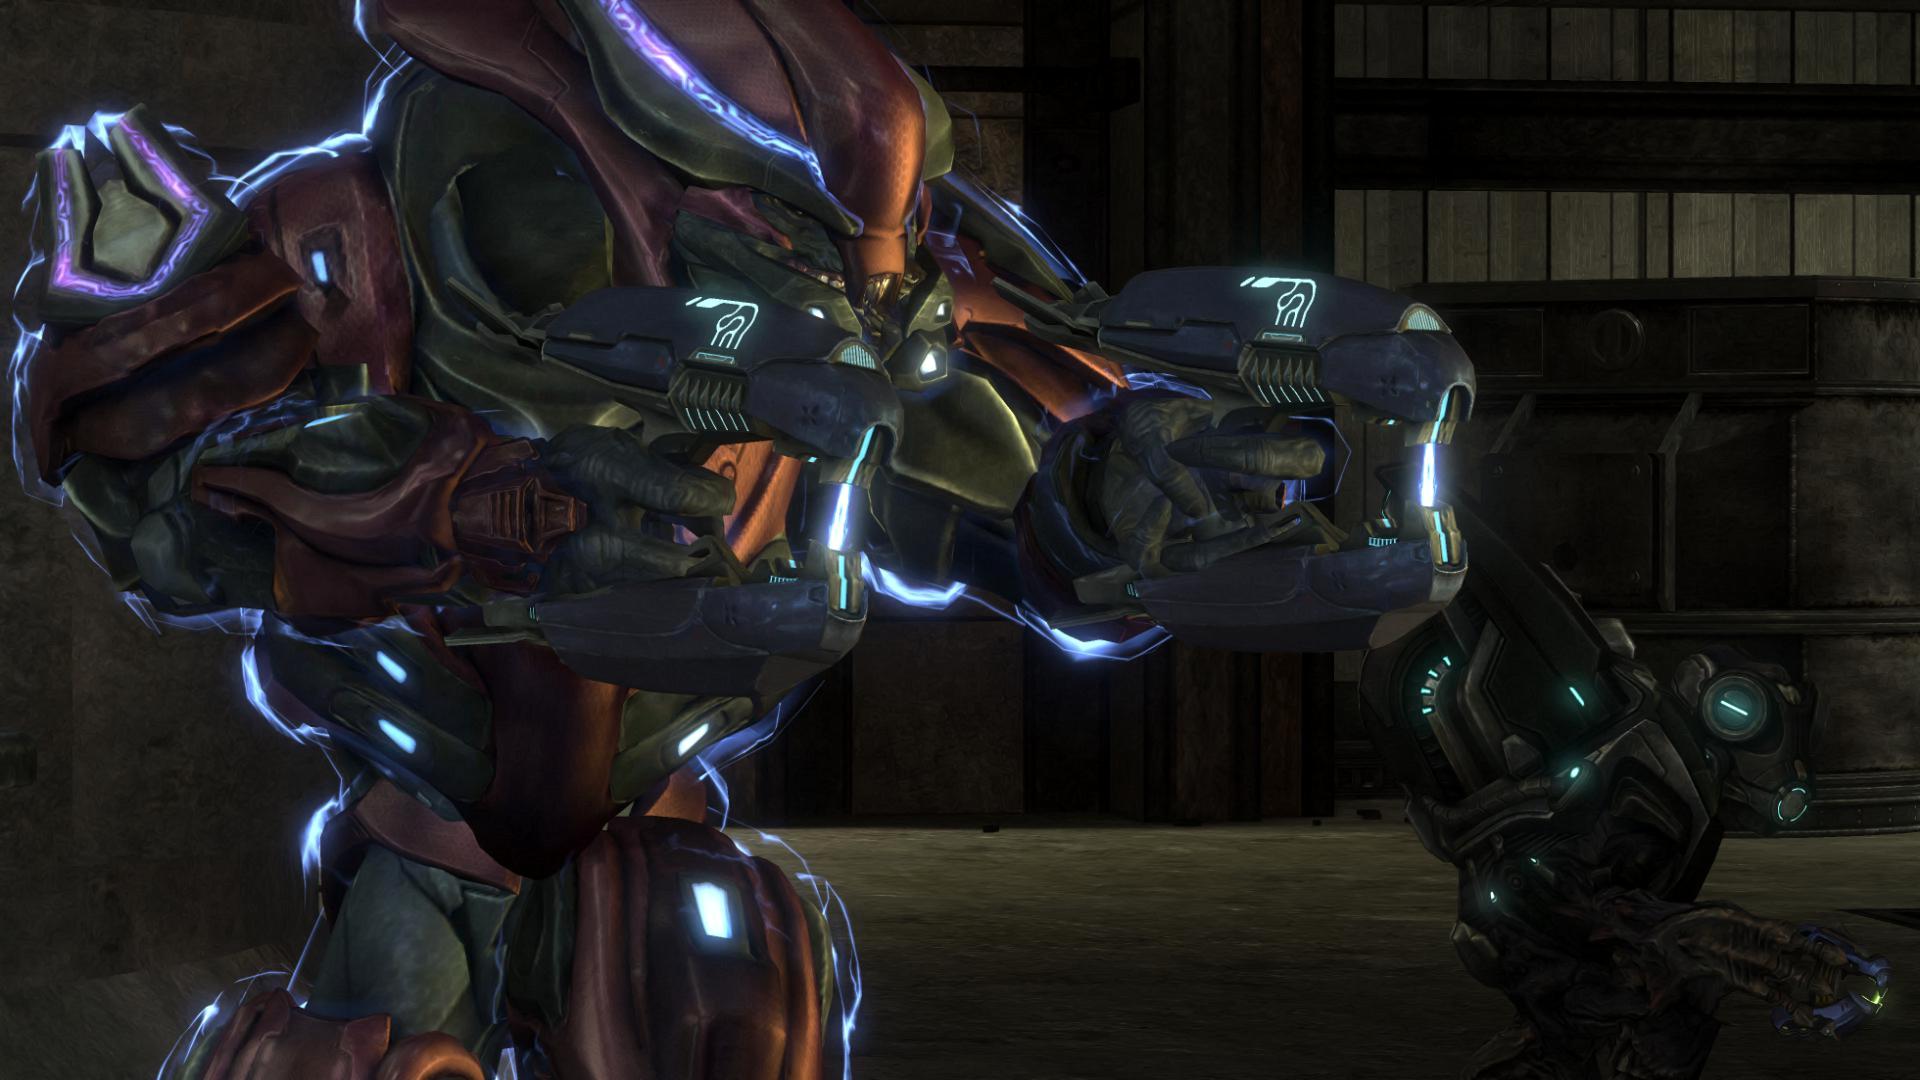 Halo Reach Elite Zealot wallpaper   668865 1920x1080